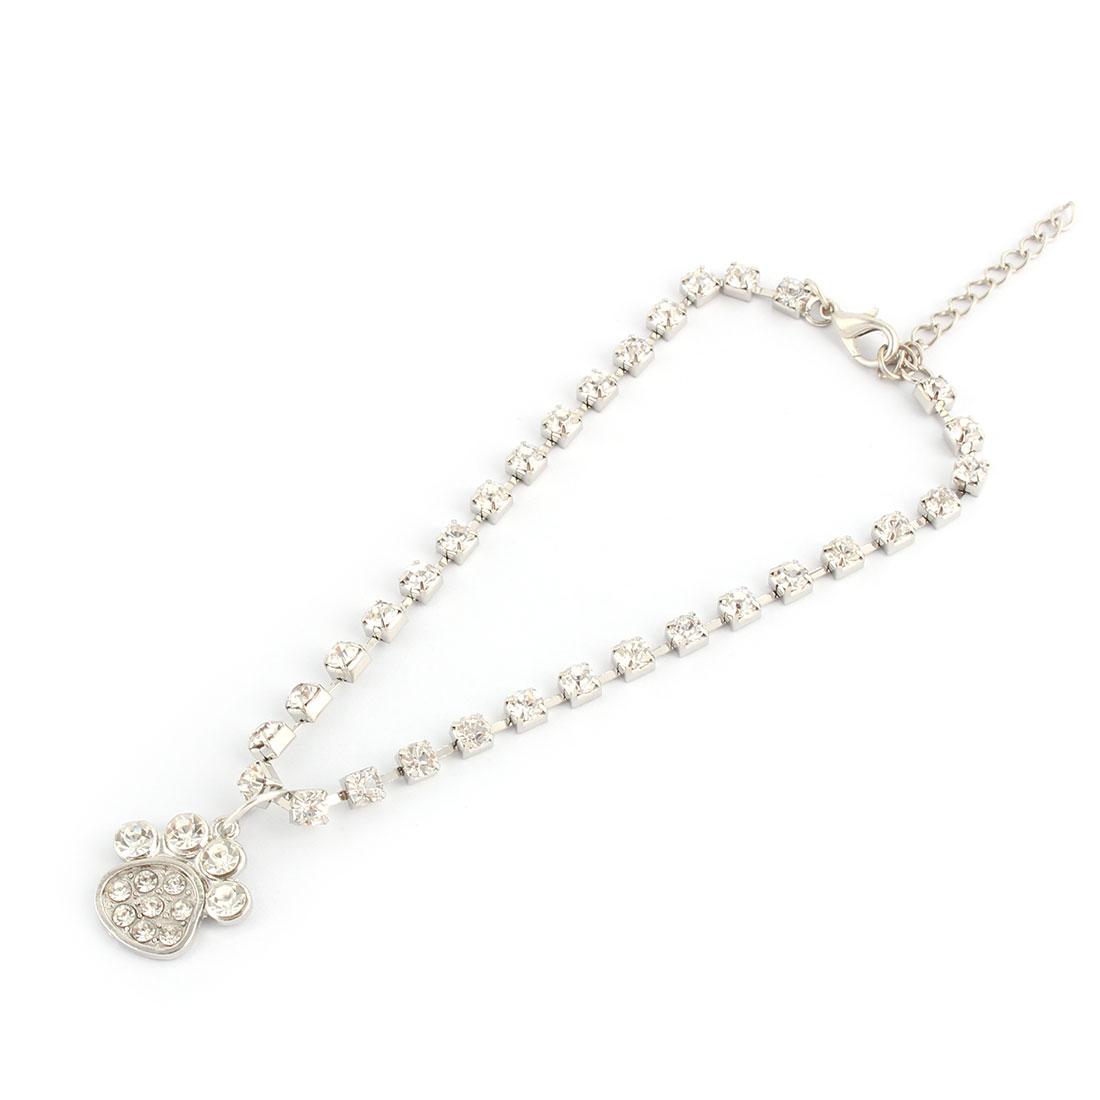 Metal Bling Rhinestone Paw Pendent Welt Pet Necklace Bracelet Silver Tone